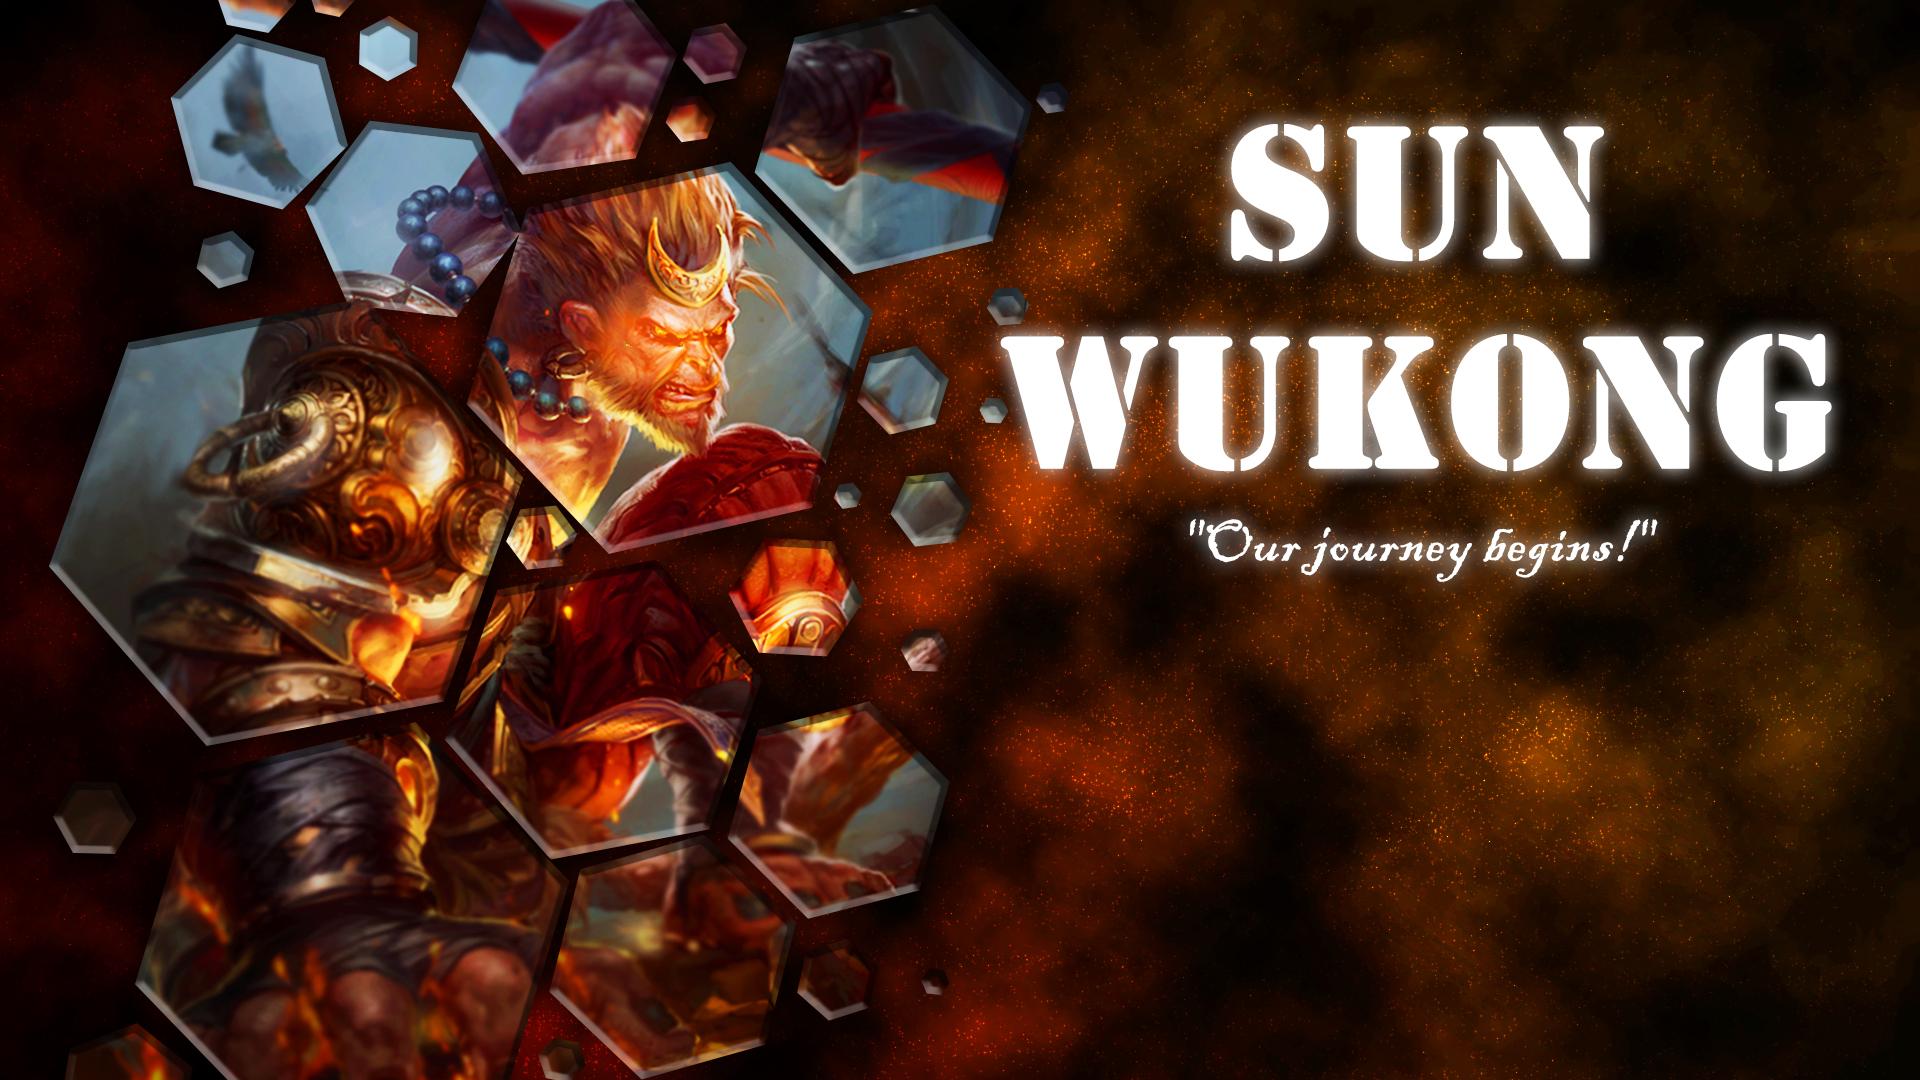 sun wukong wallpaper by bveckie on deviantart